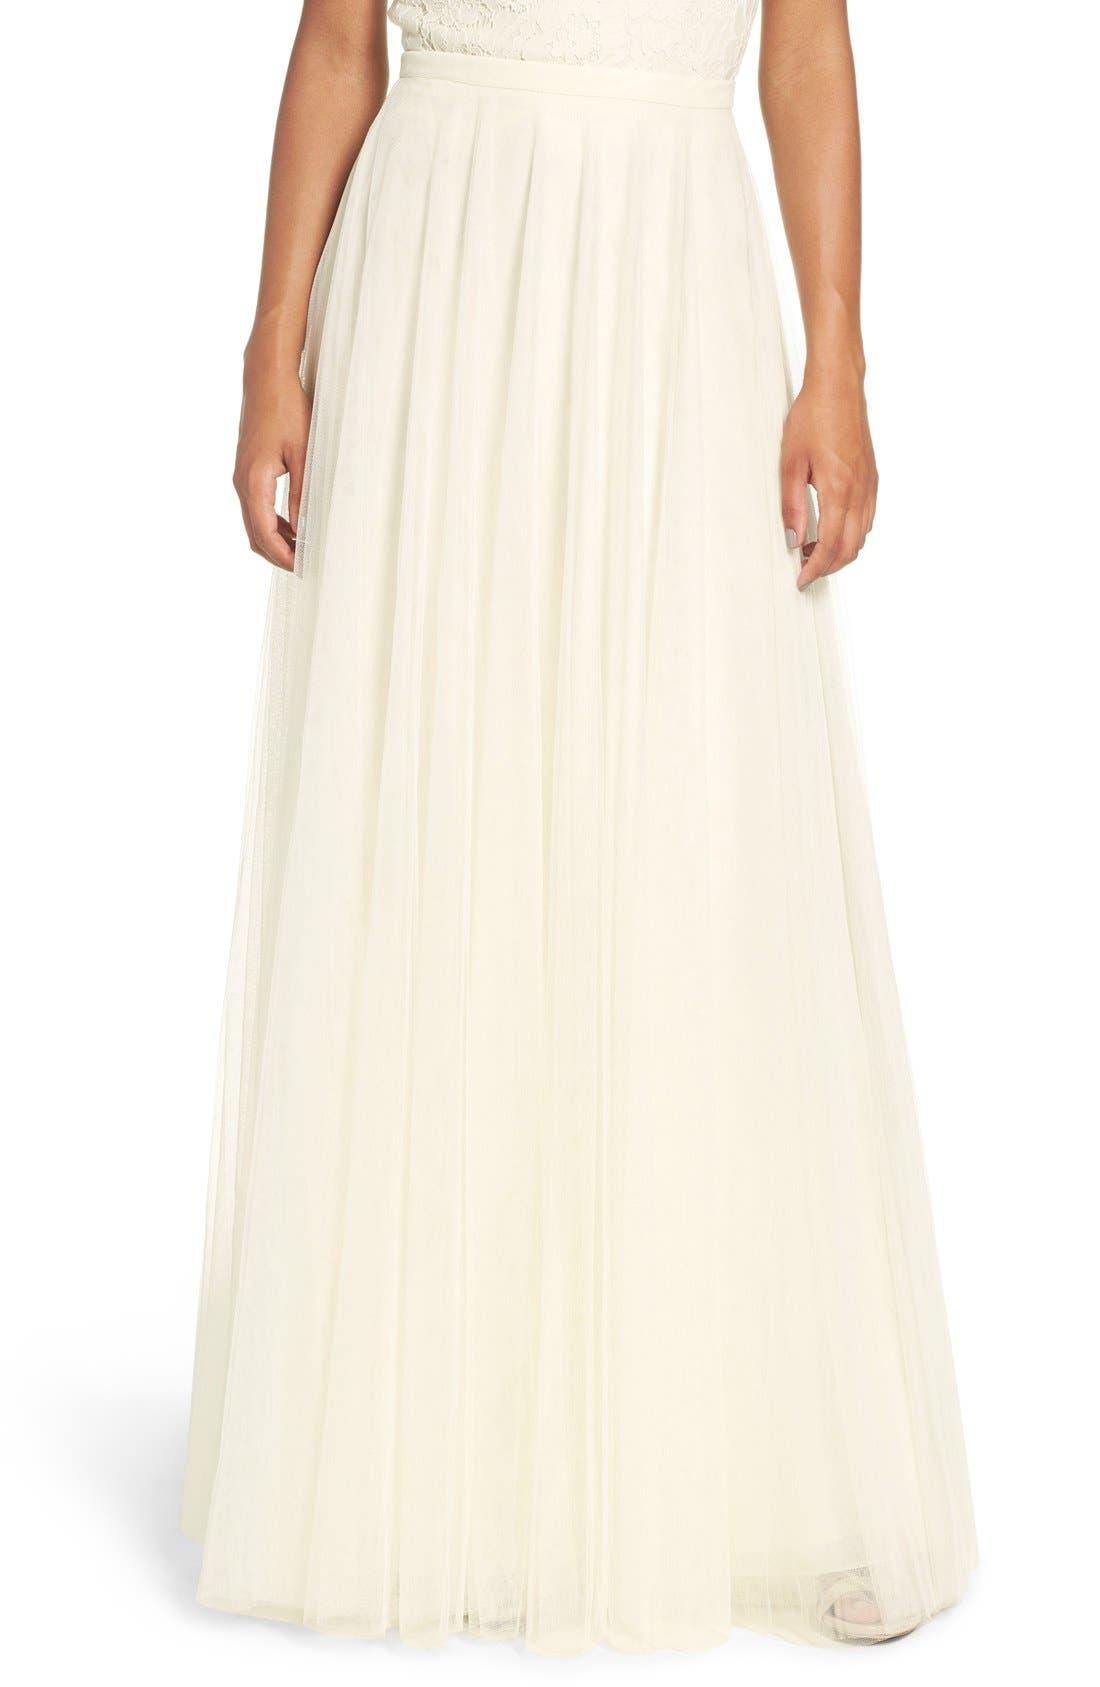 Main Image - Jenny Yoo 'Winslow' Long Tulle A-Line Skirt